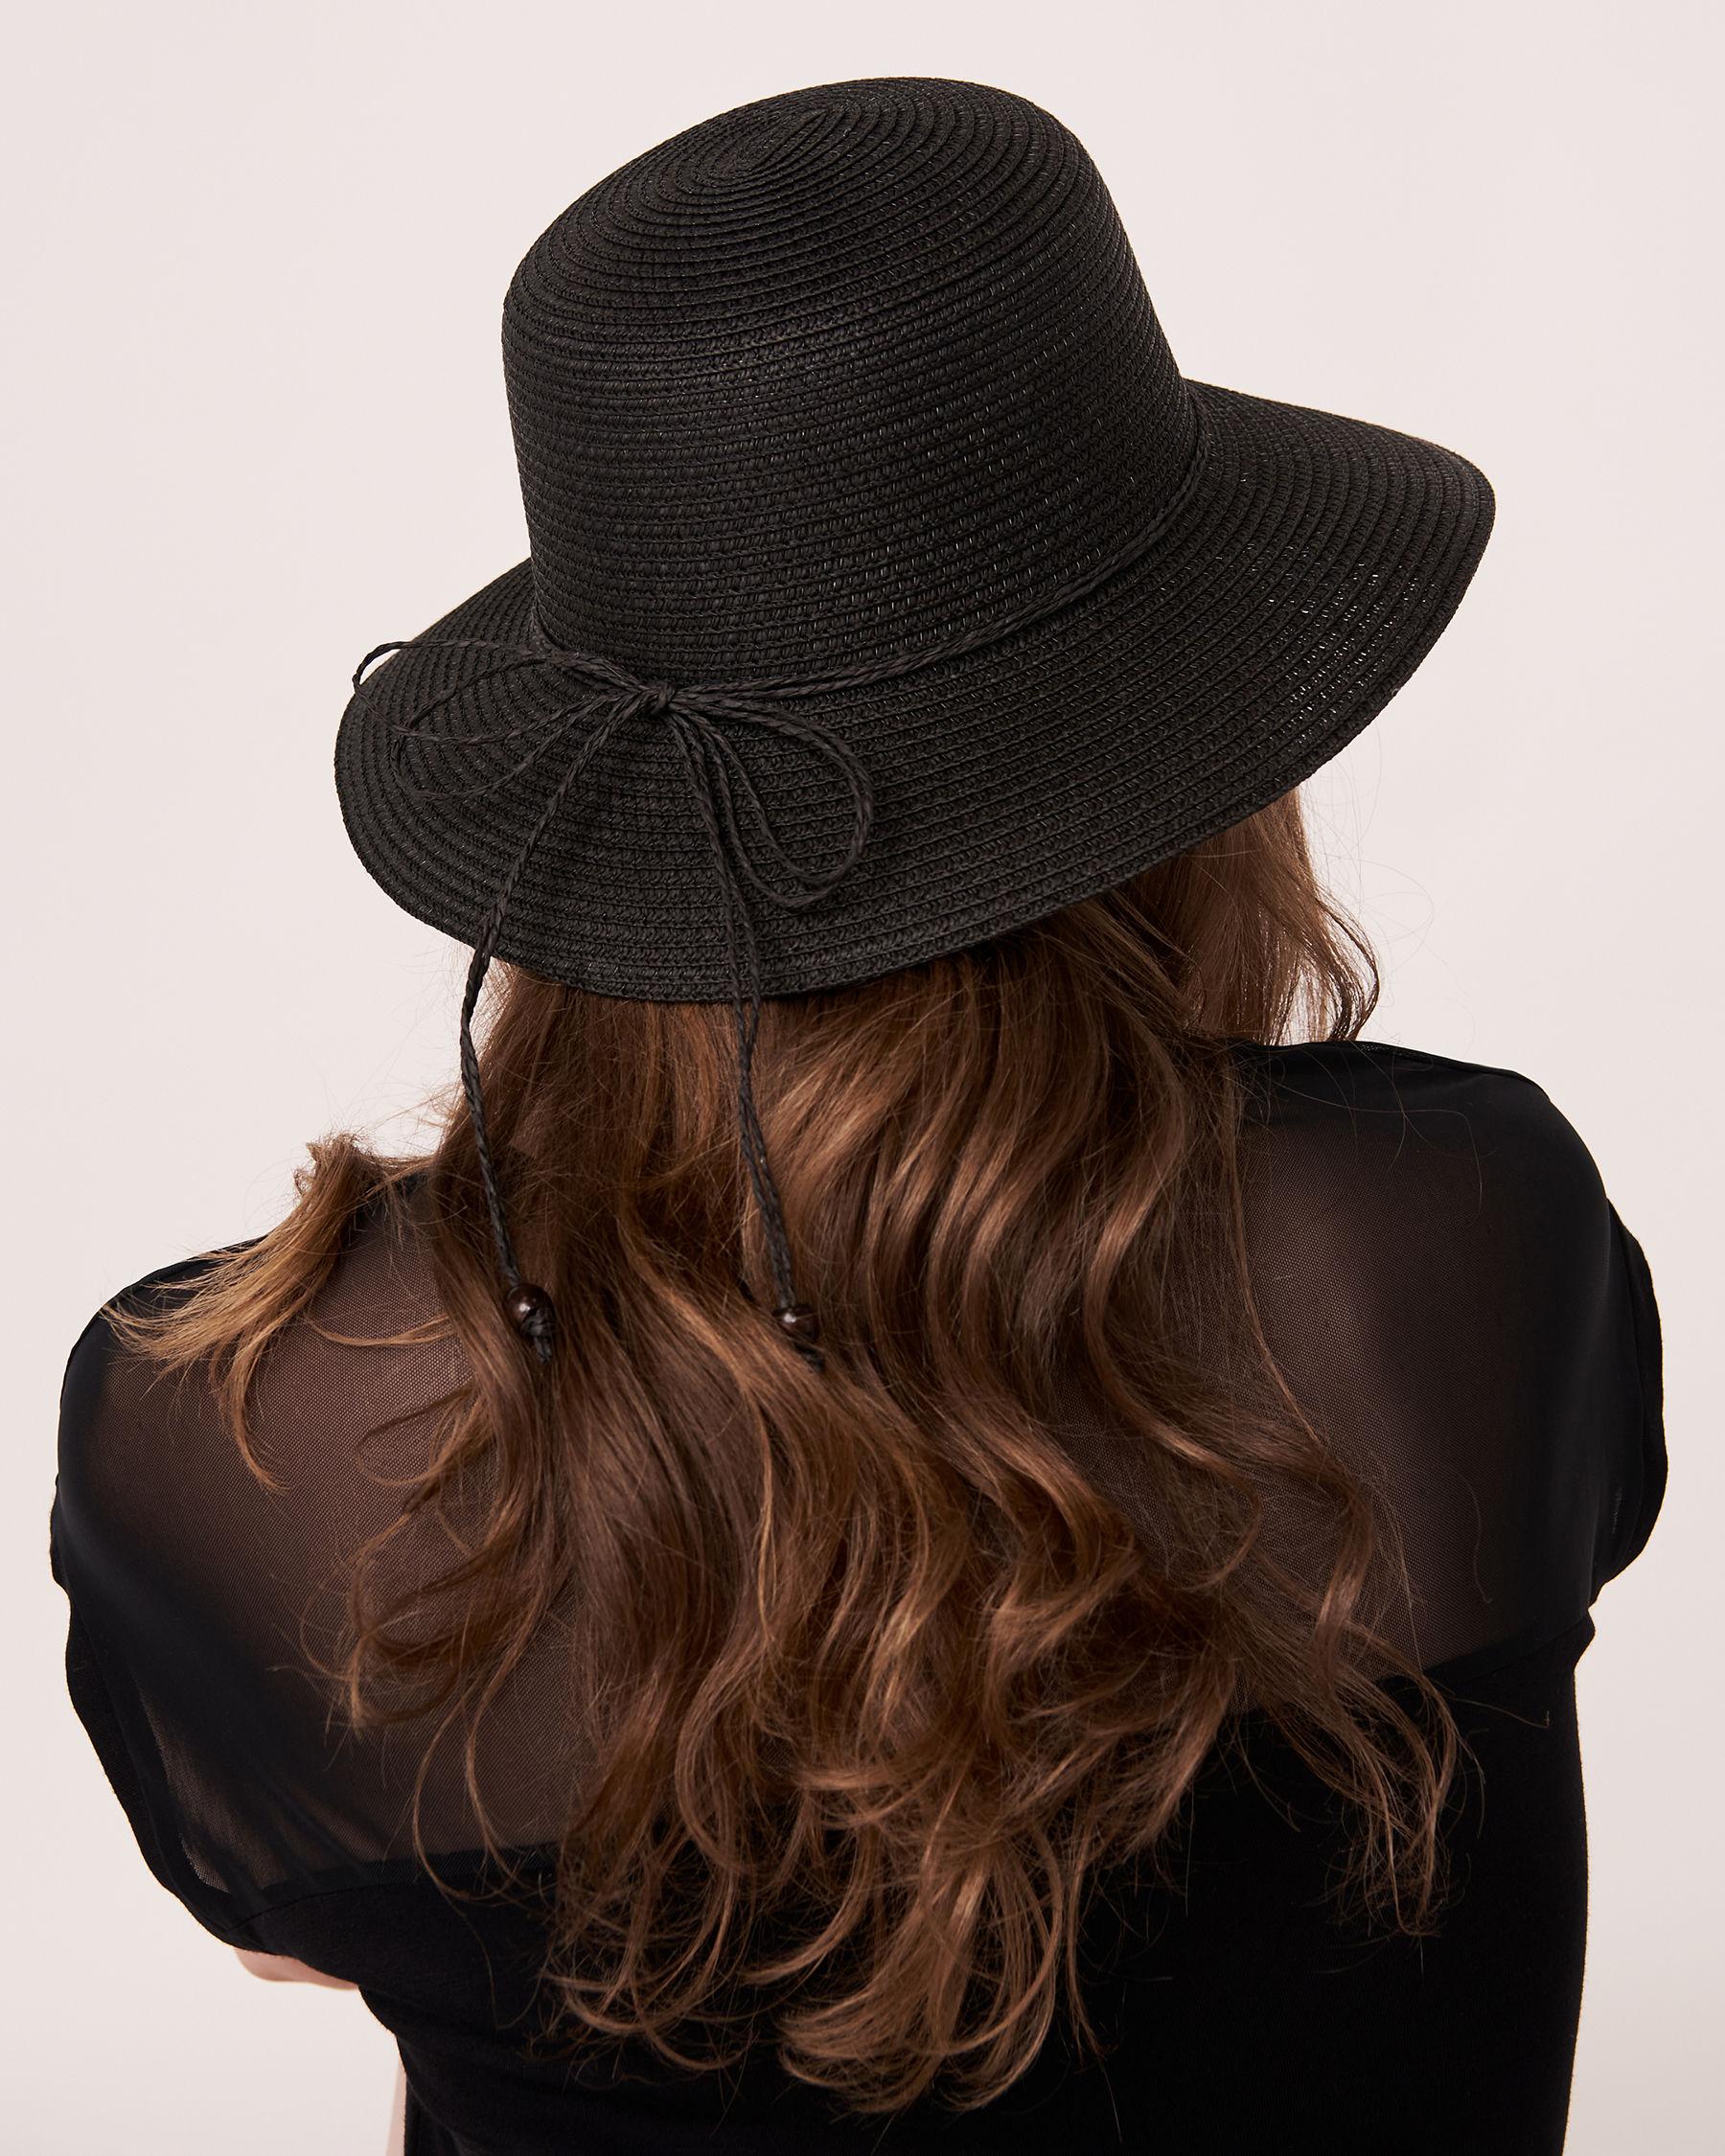 LA VIE EN ROSE AQUA Cloche Hat with String Black 80500009 - View2